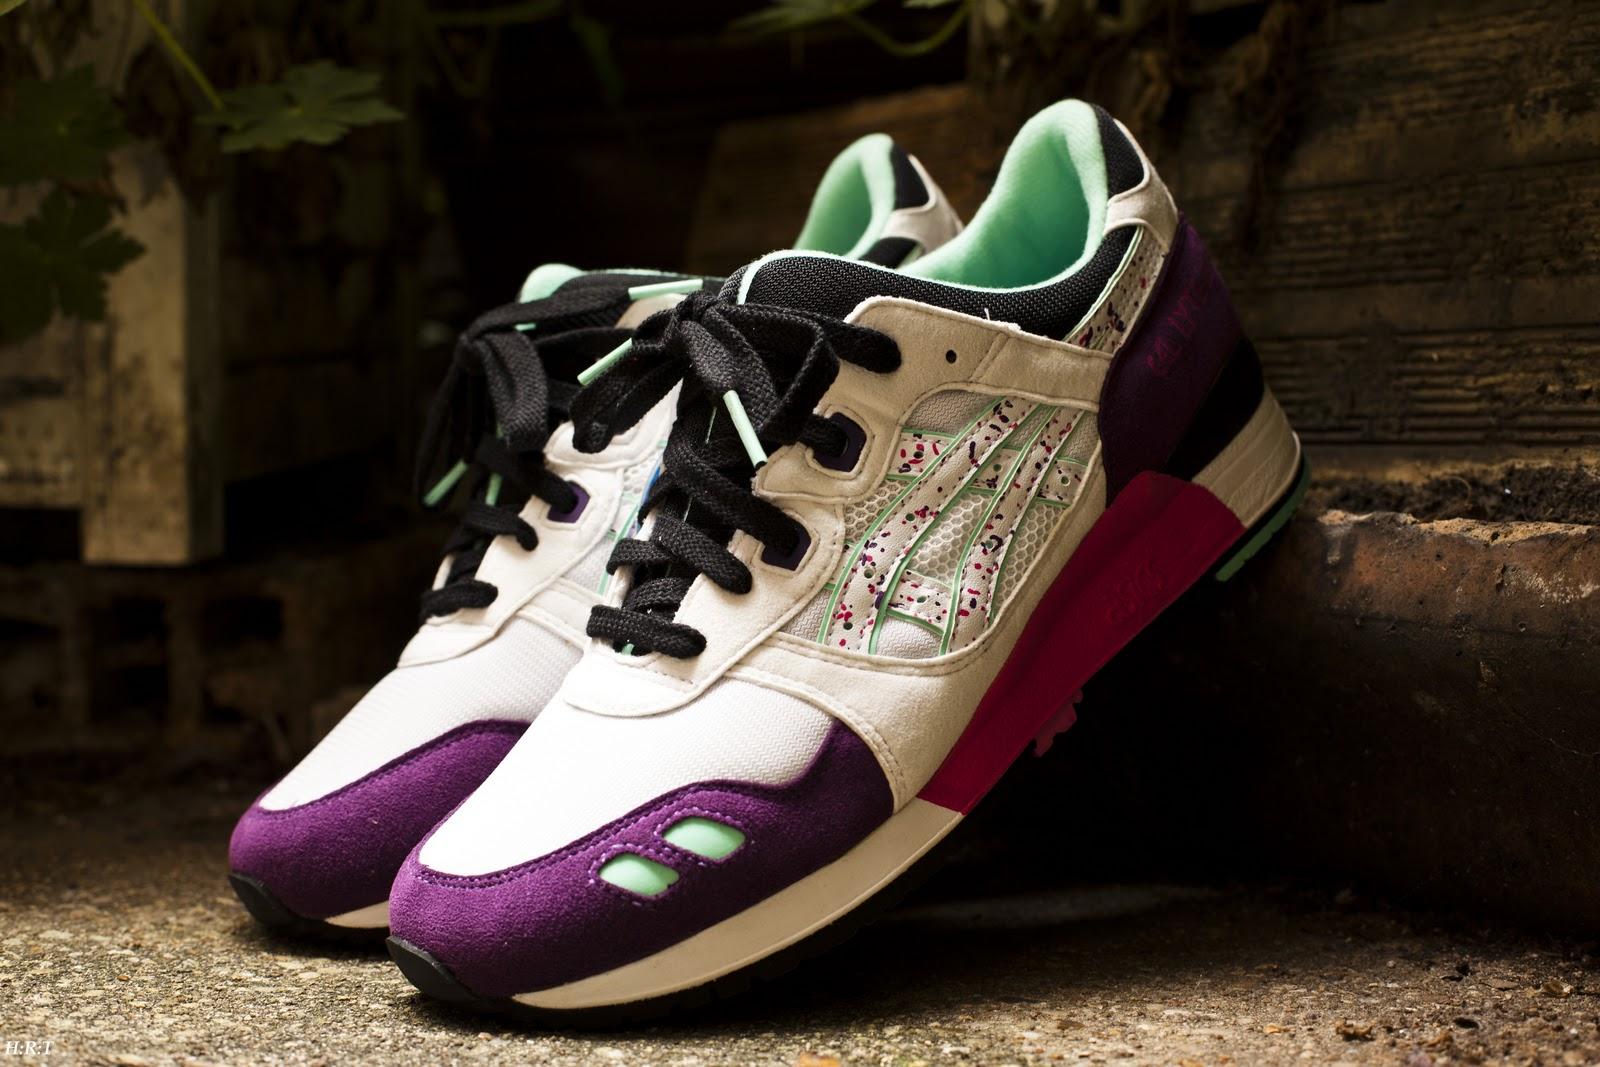 new product eeb3b cbe68 Step Into My Running Shoes: Asics Gel Lyte III x Colette x LaMJC